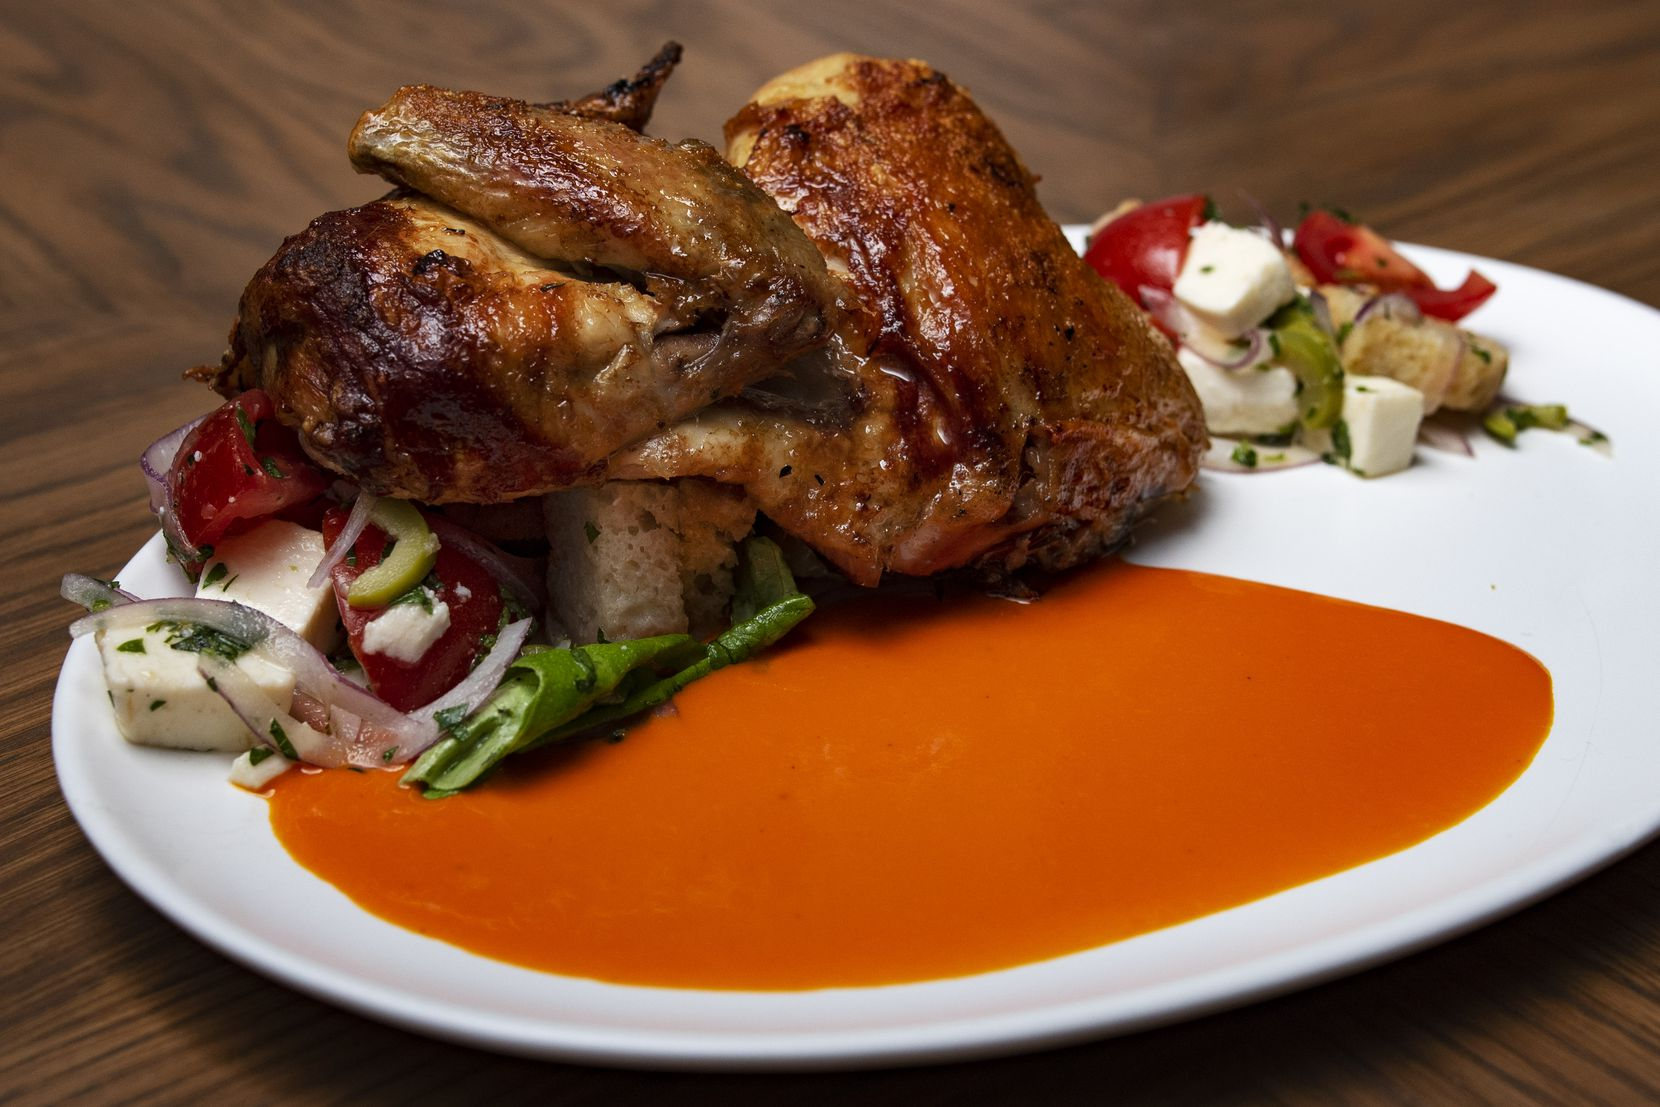 Chef Graham Dodds is making rotisserie chicken with panzanella salad and piquillo vinaigrette at Elm & Good restaurant.